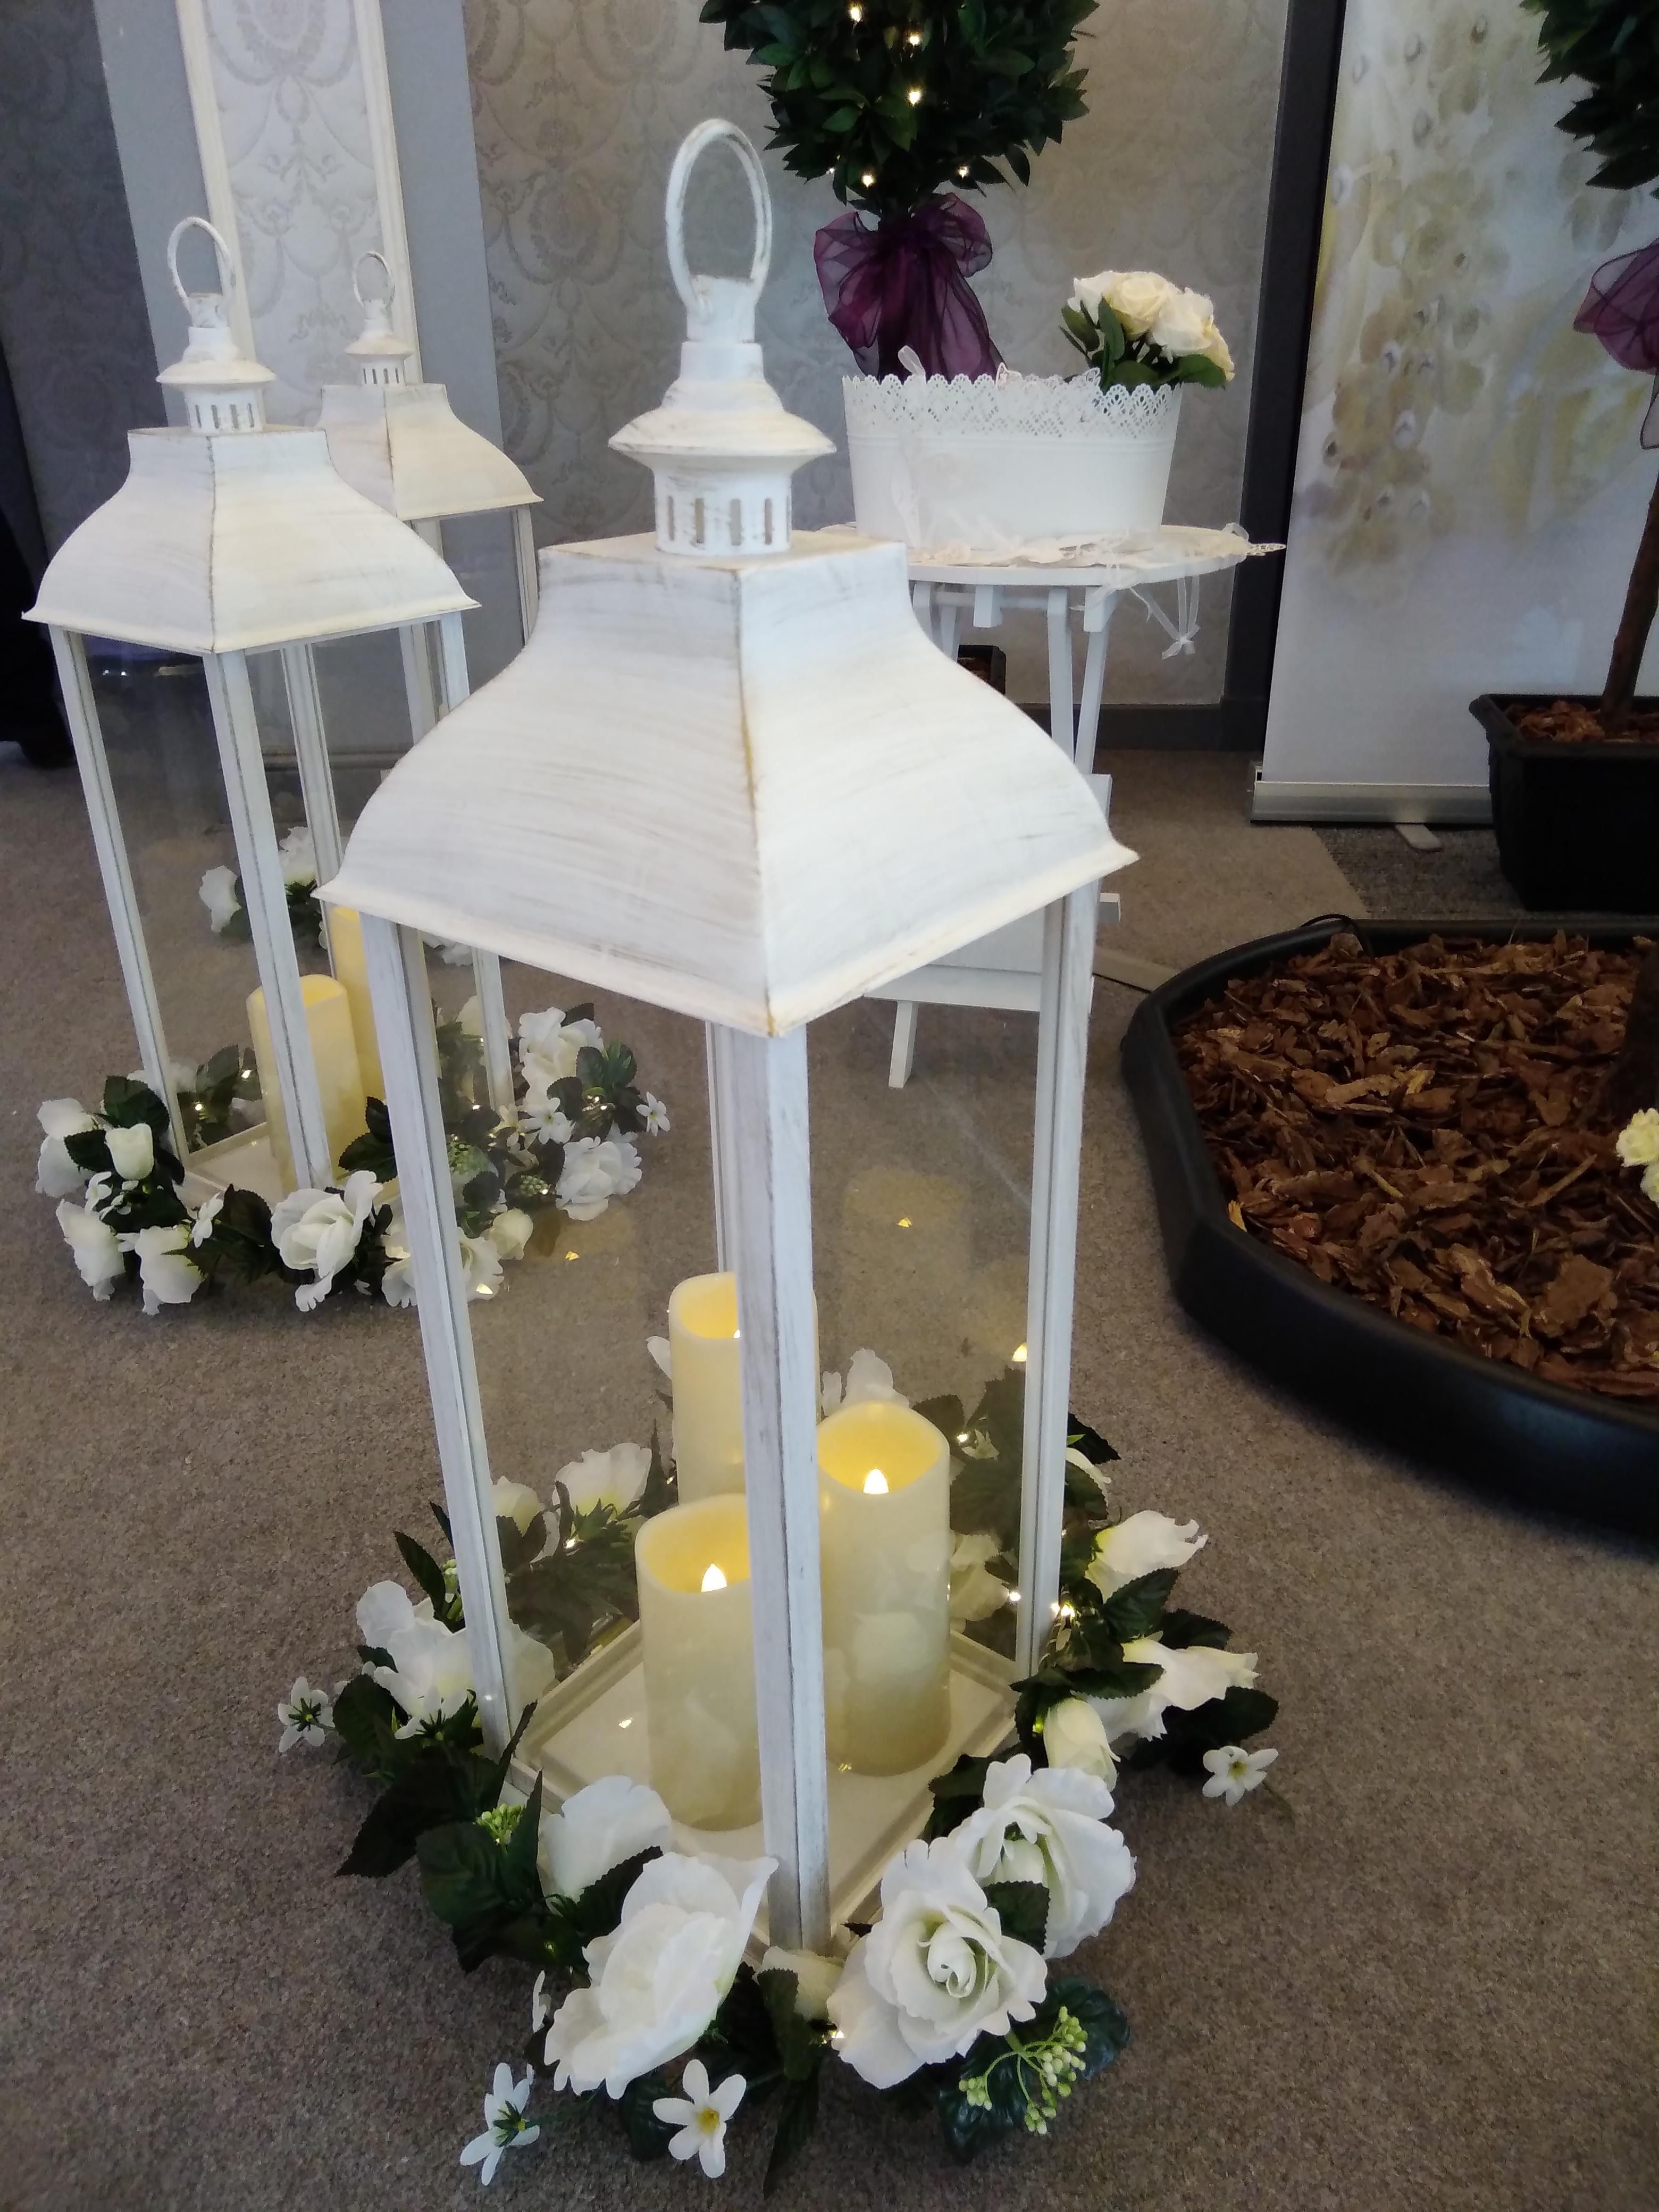 Wedding Lanterns with Rose Garlands at The Parsonage